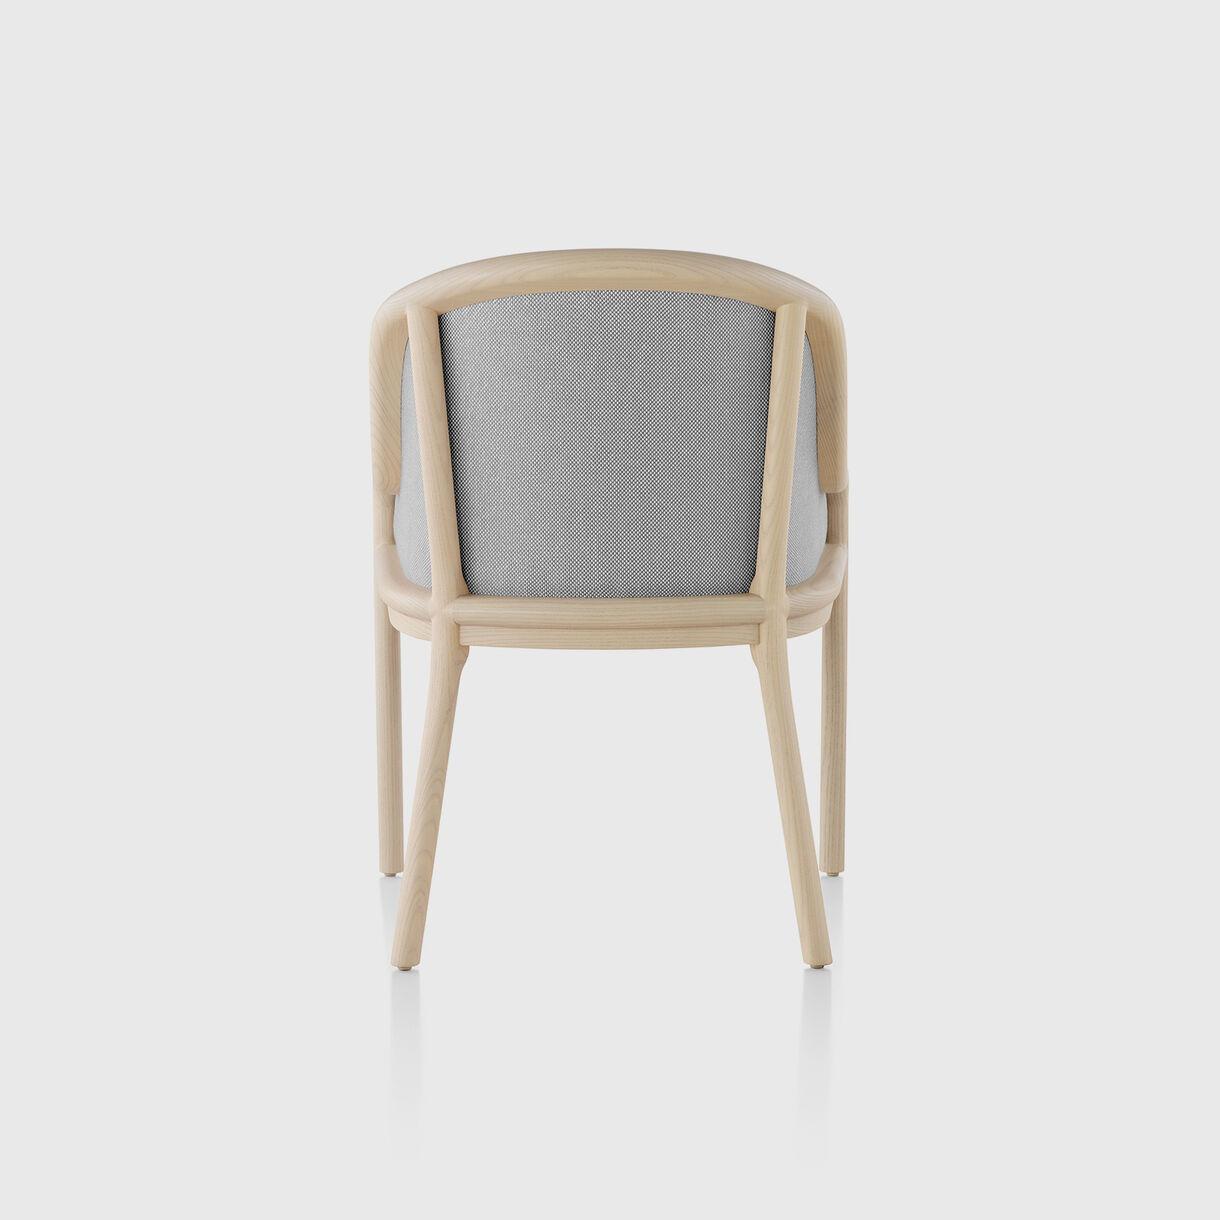 Landmark Low Arm Chair, Upholstered